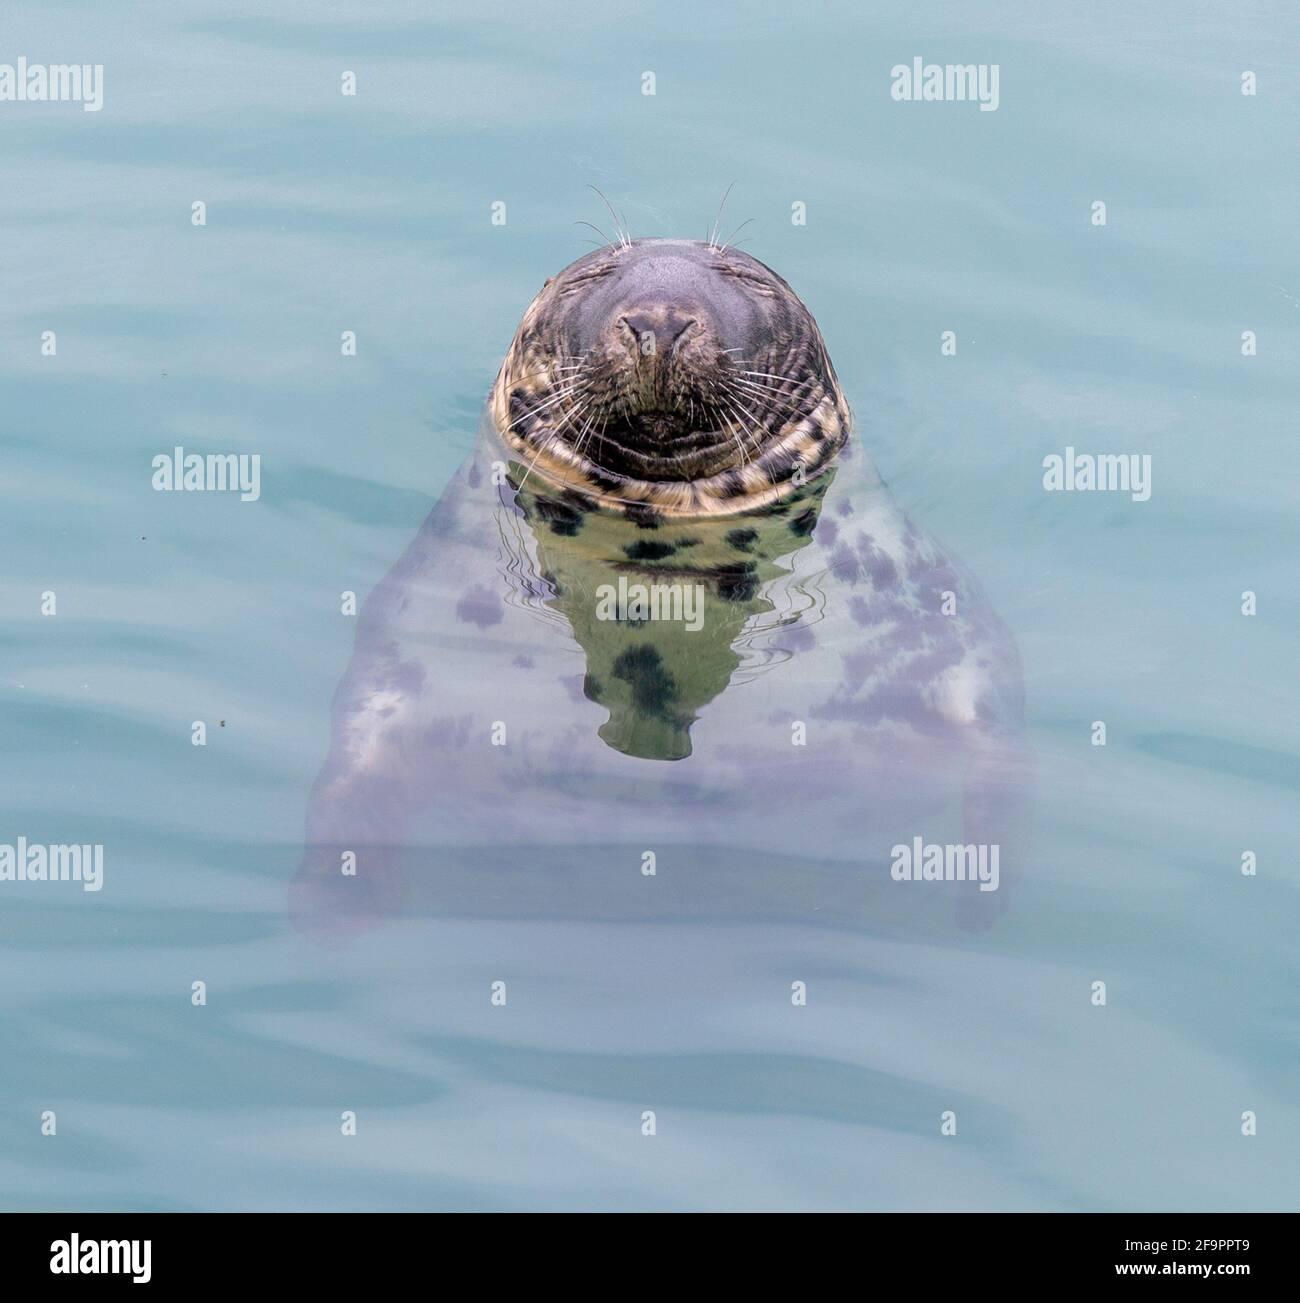 grey-seal-halichoerus-grypus-asleep-while-floating-in-the-sea-ireland-2F9PPT9.jpg